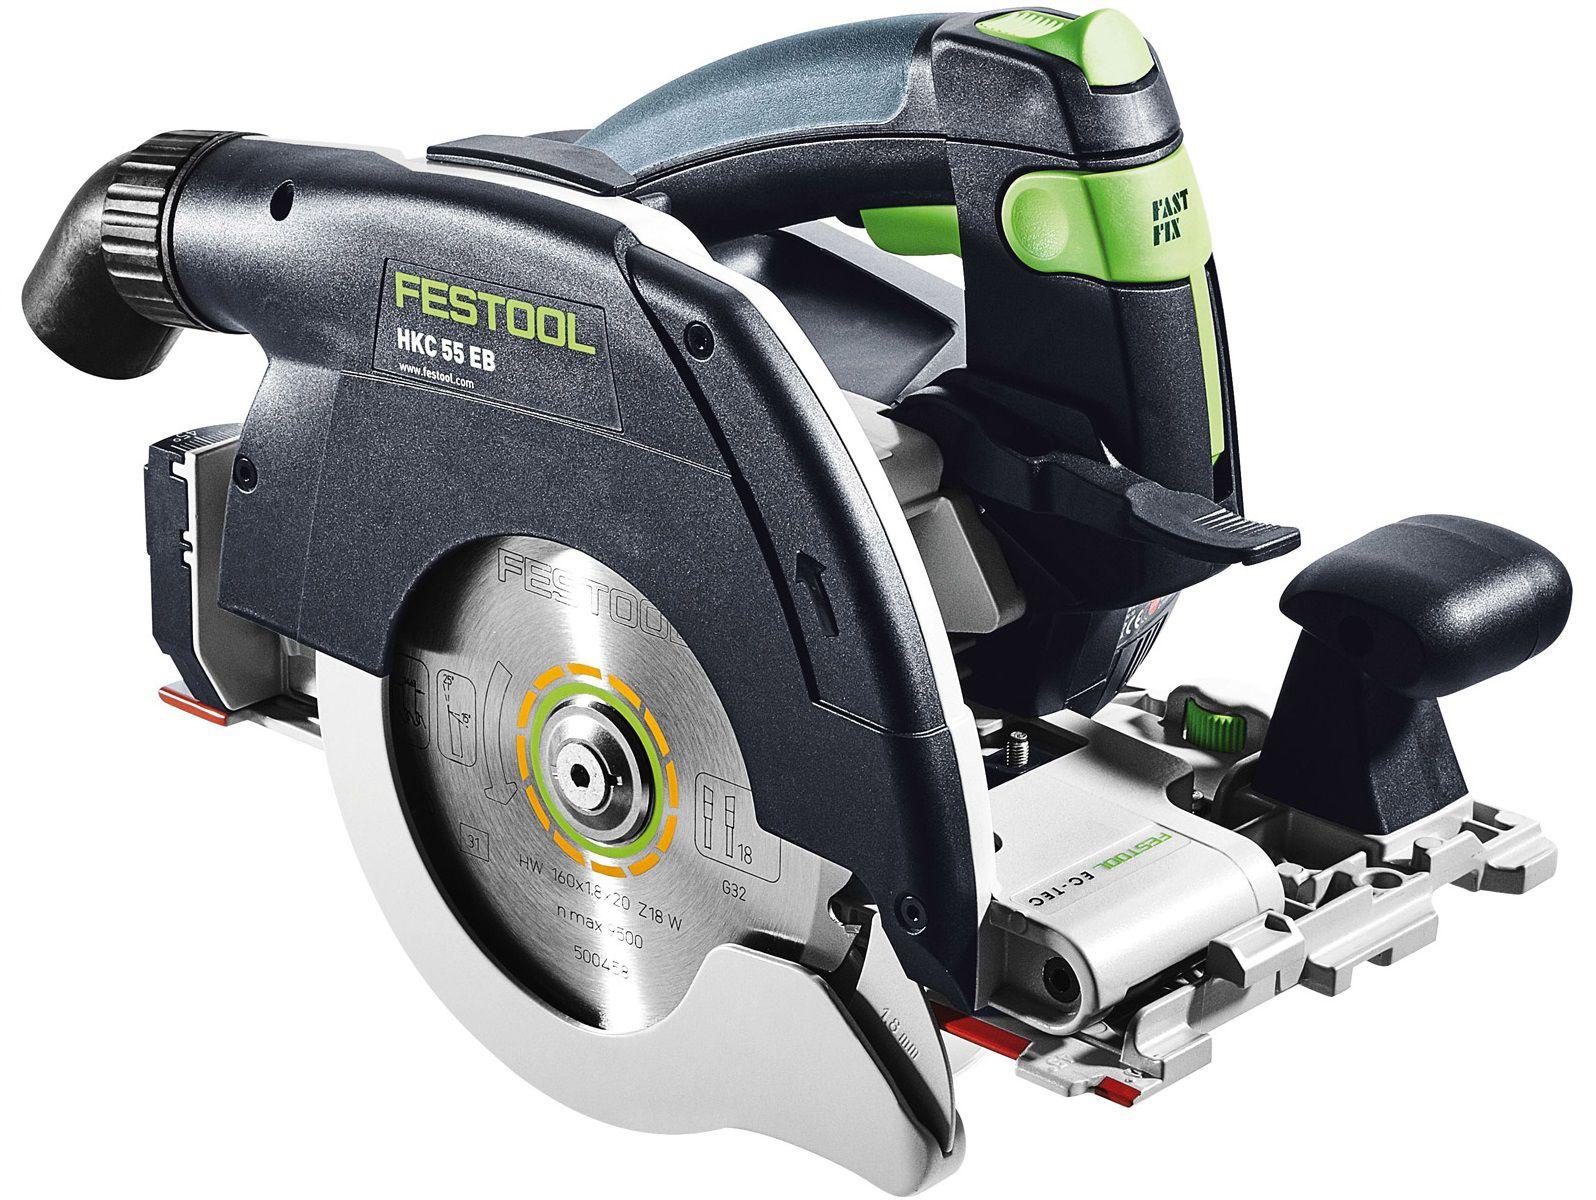 Aku okružní kotoučová pila Festool HKC 55 Li 5,2 EB-Plus, 160mm, 2x aku 18V/5.2Ah, 4.1kg, kufr SYS 4 T-LOC, kód: 201360